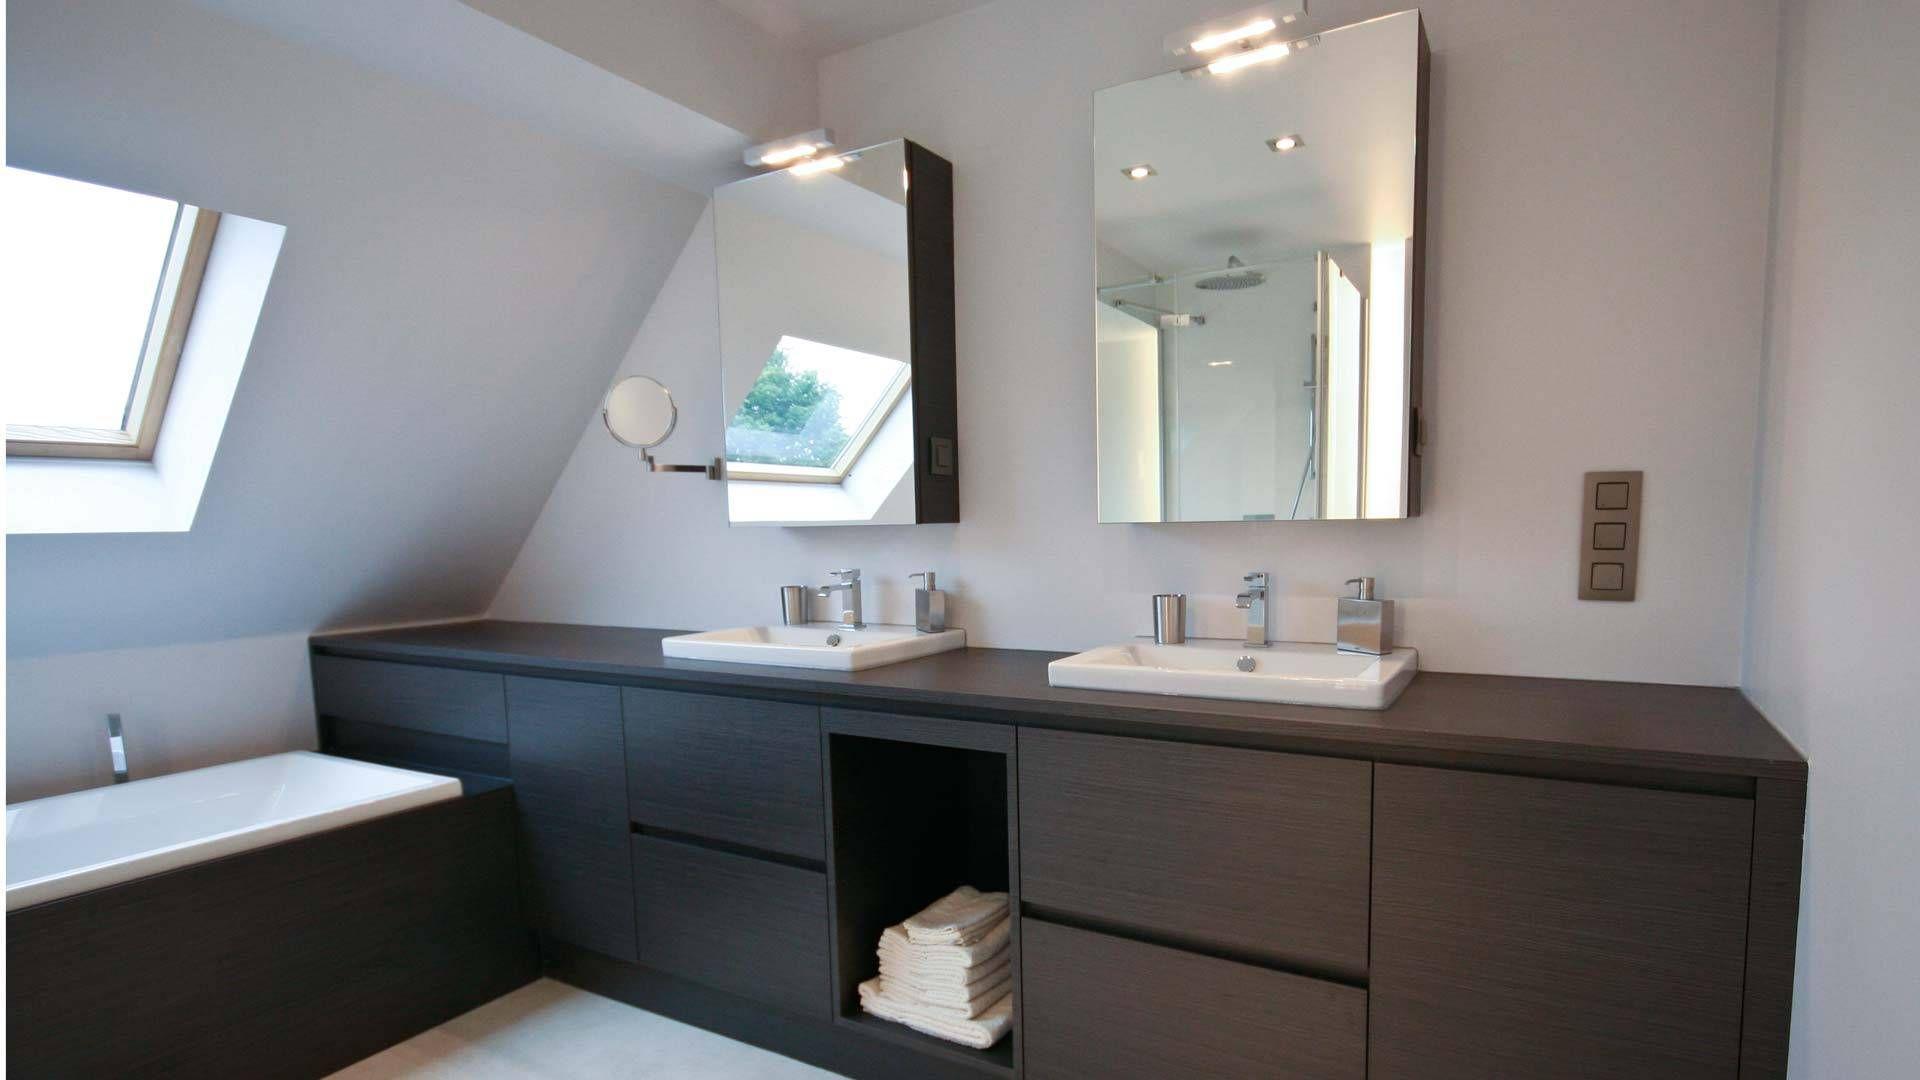 nl funvit bad voor badkamer